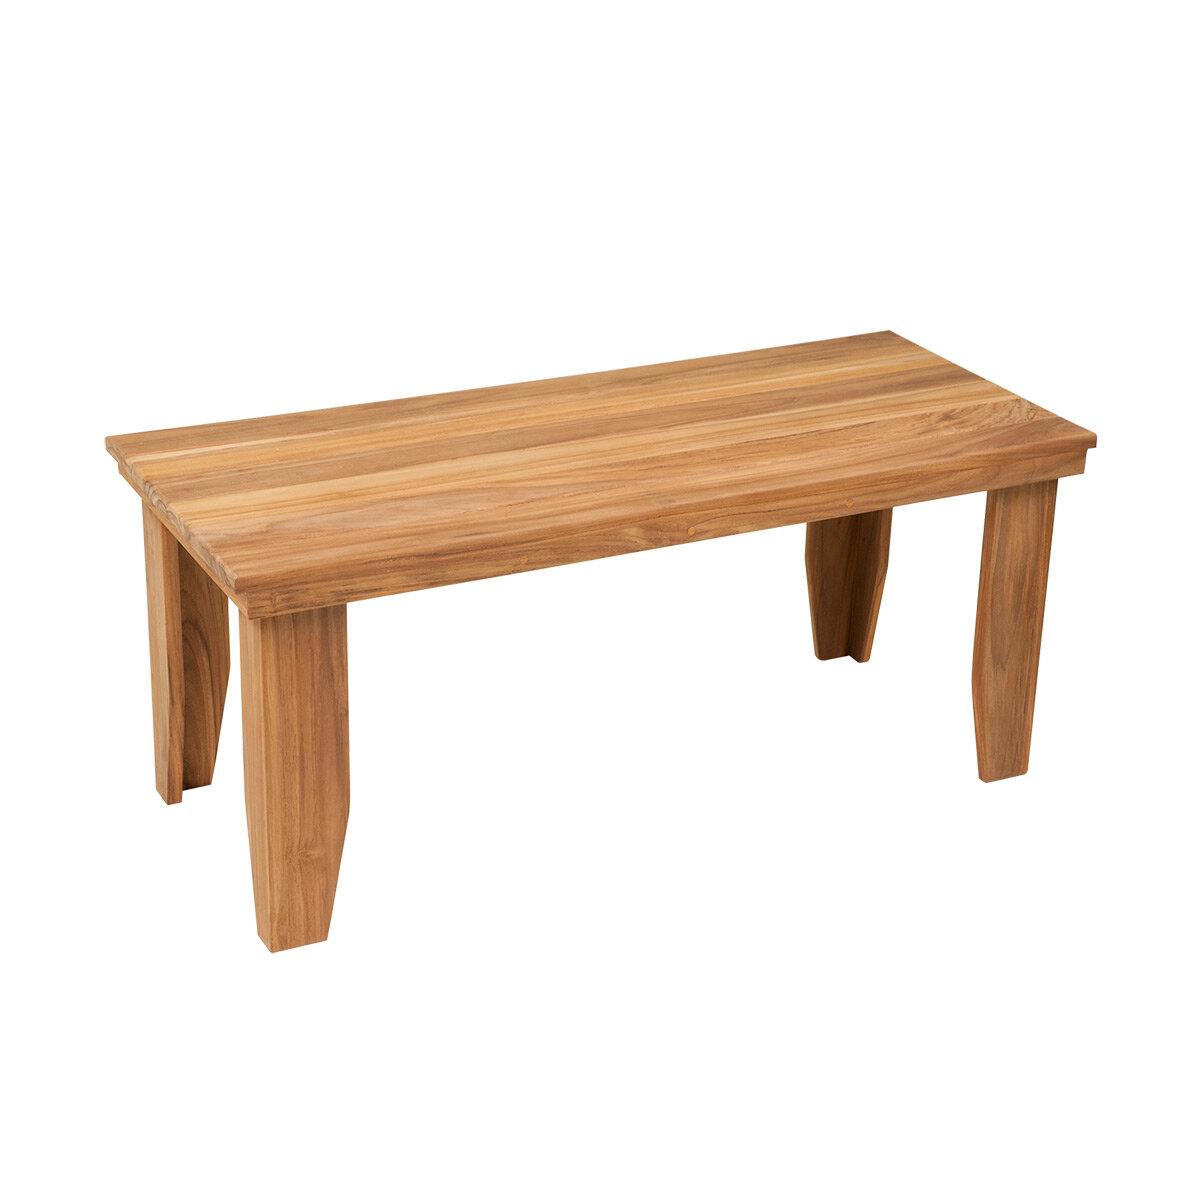 Rebrilliant Teak Natural Wood Shower Seat | Wayfair